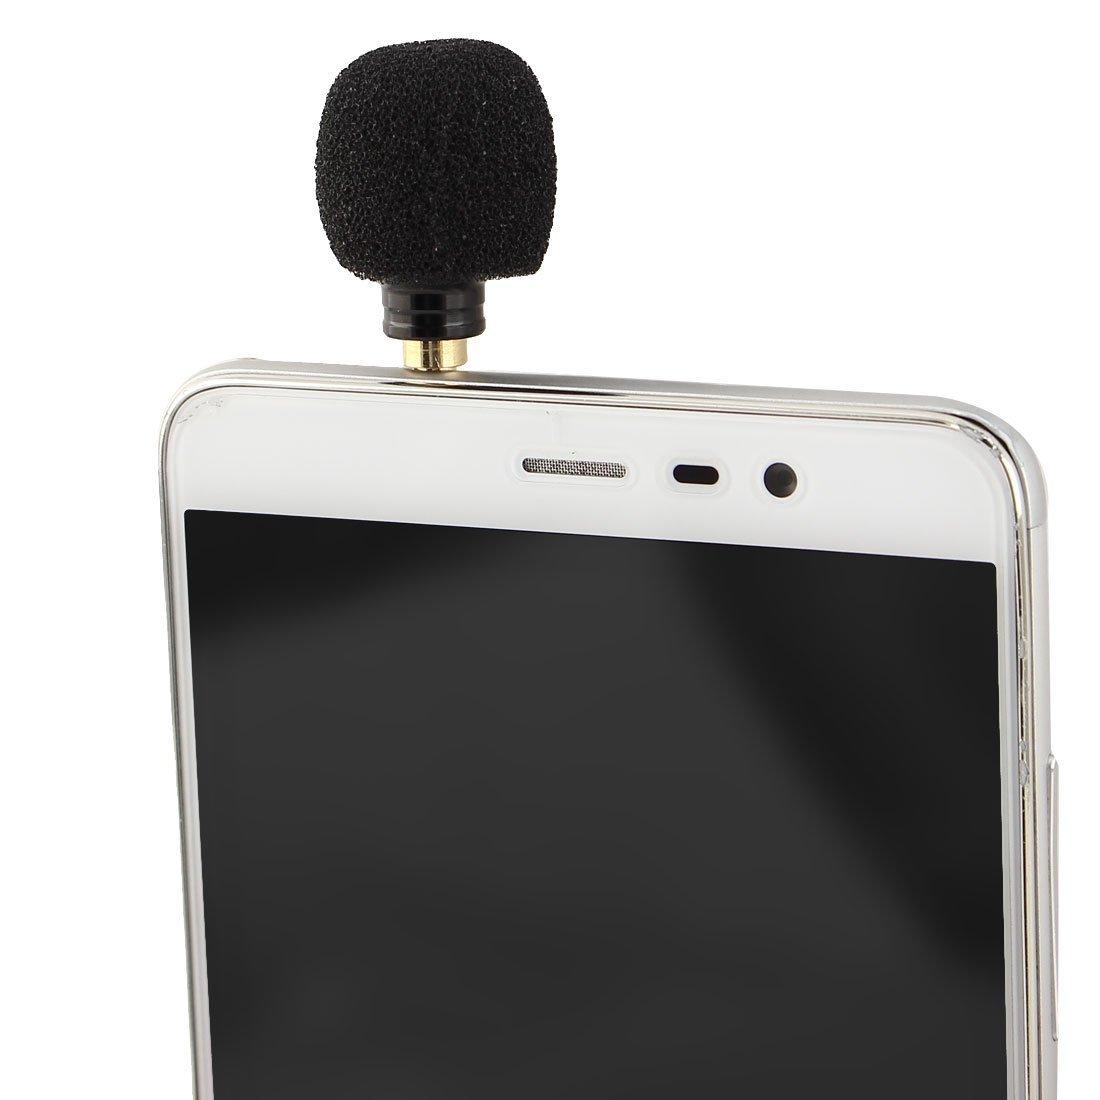 Amazon.com: eDealMax portátil de Mano 3.5mm Mini micrófono Negro Para Smartphone Tablet: Electronics